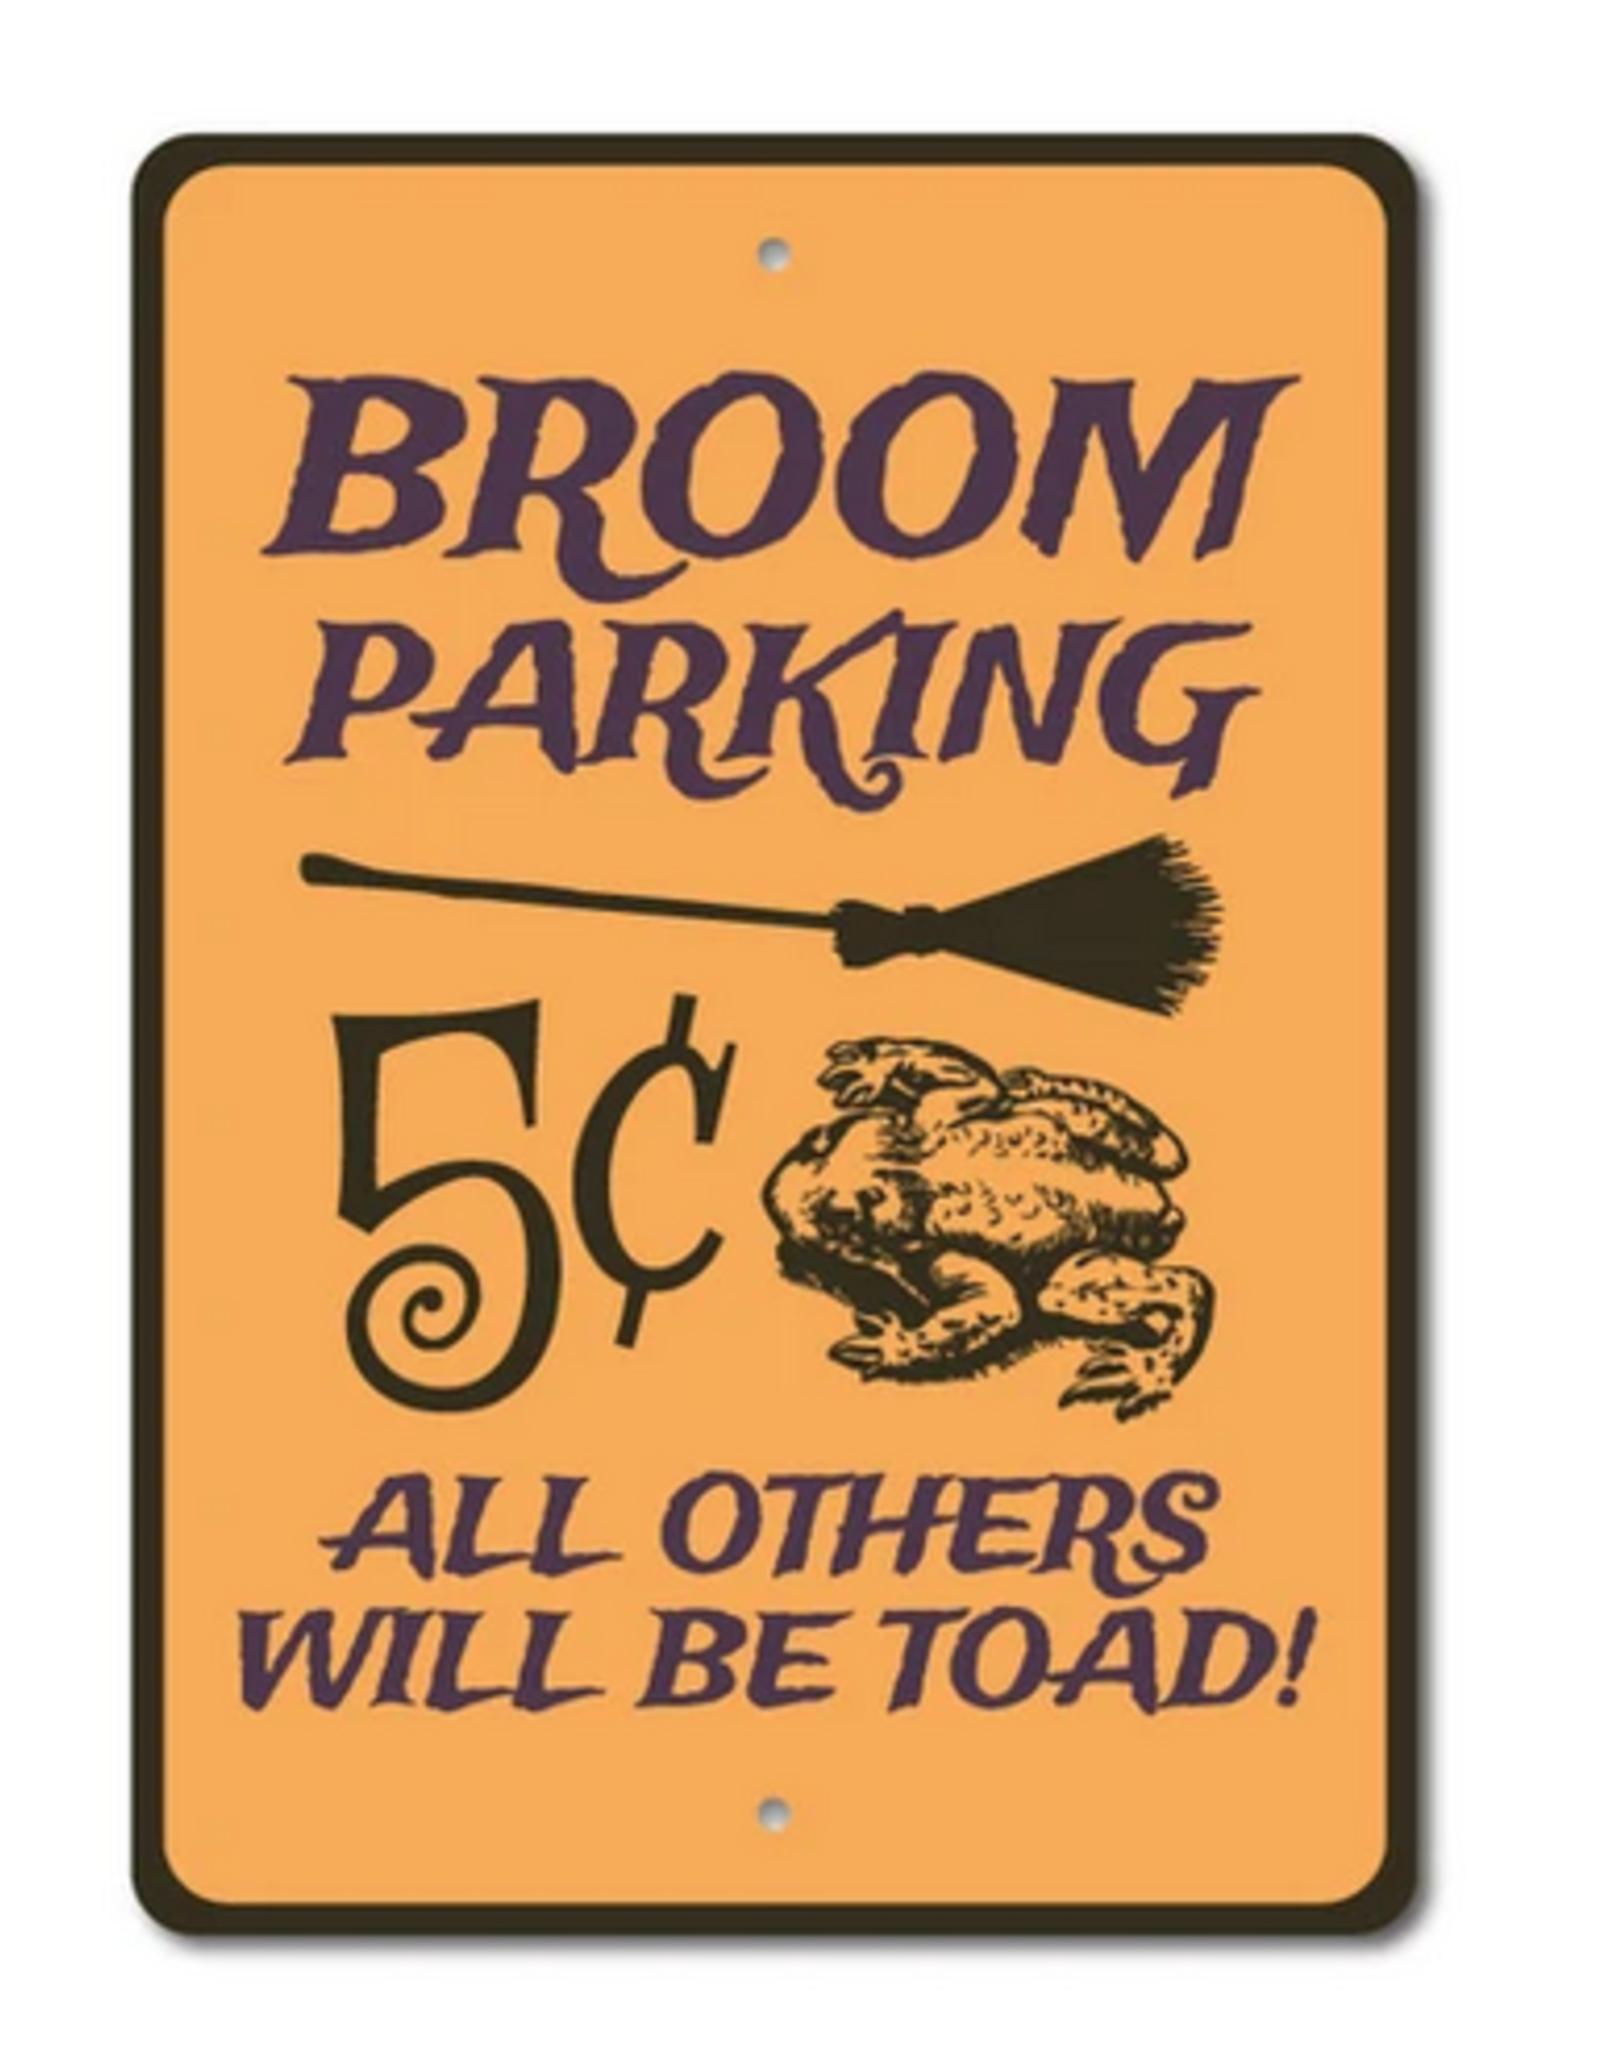 Lizton Sign Shop Broom Parking Sign - 10x14 inches*